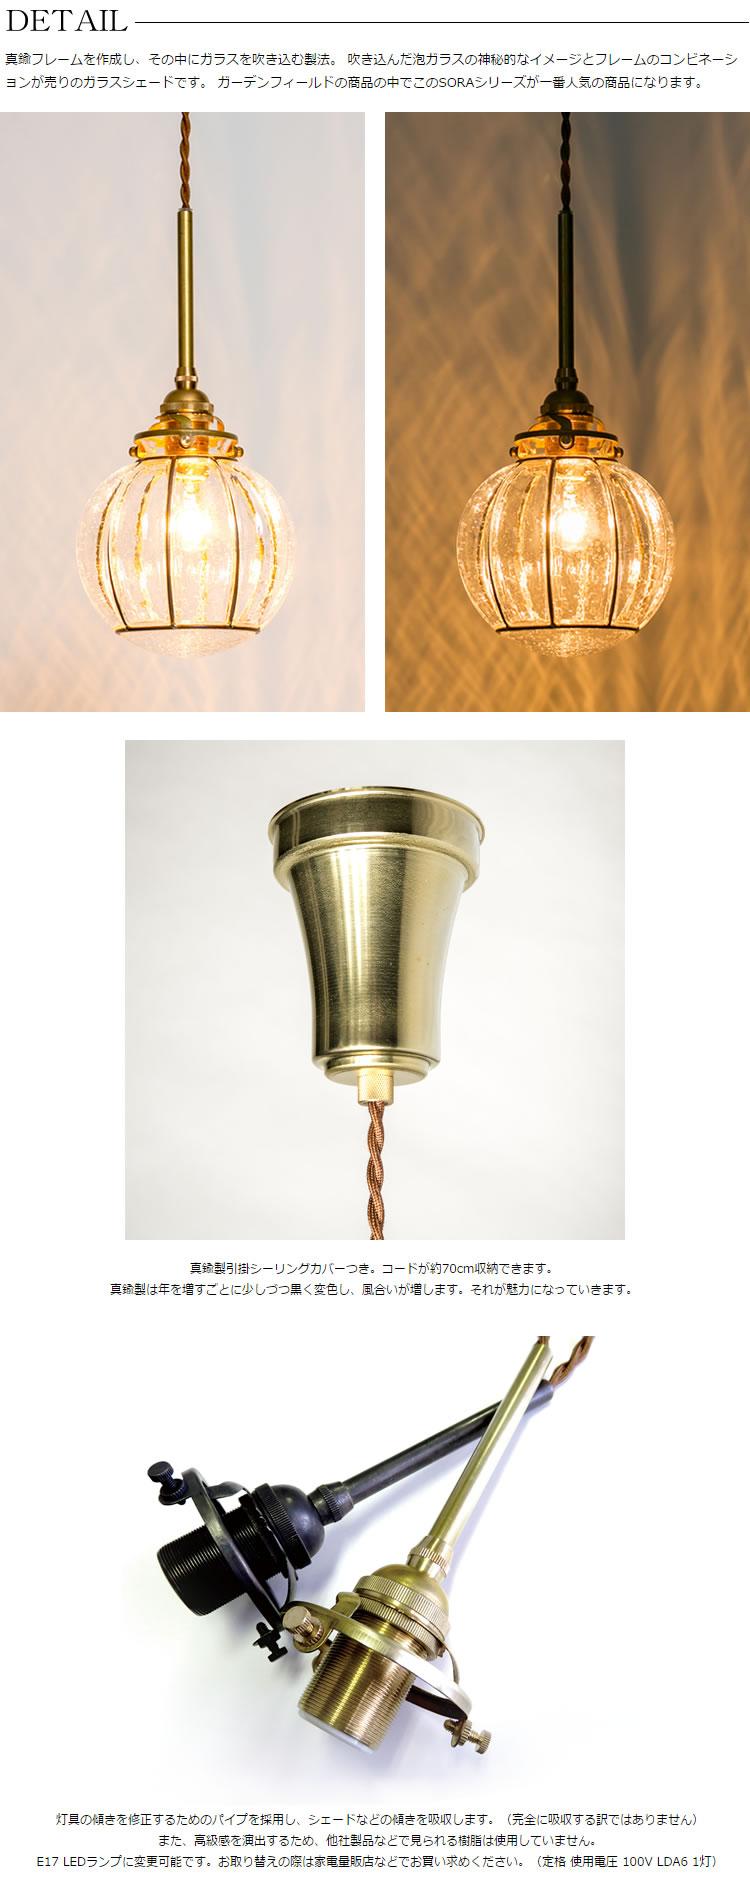 SORA(泡入りガラス・引掛・真鍮)